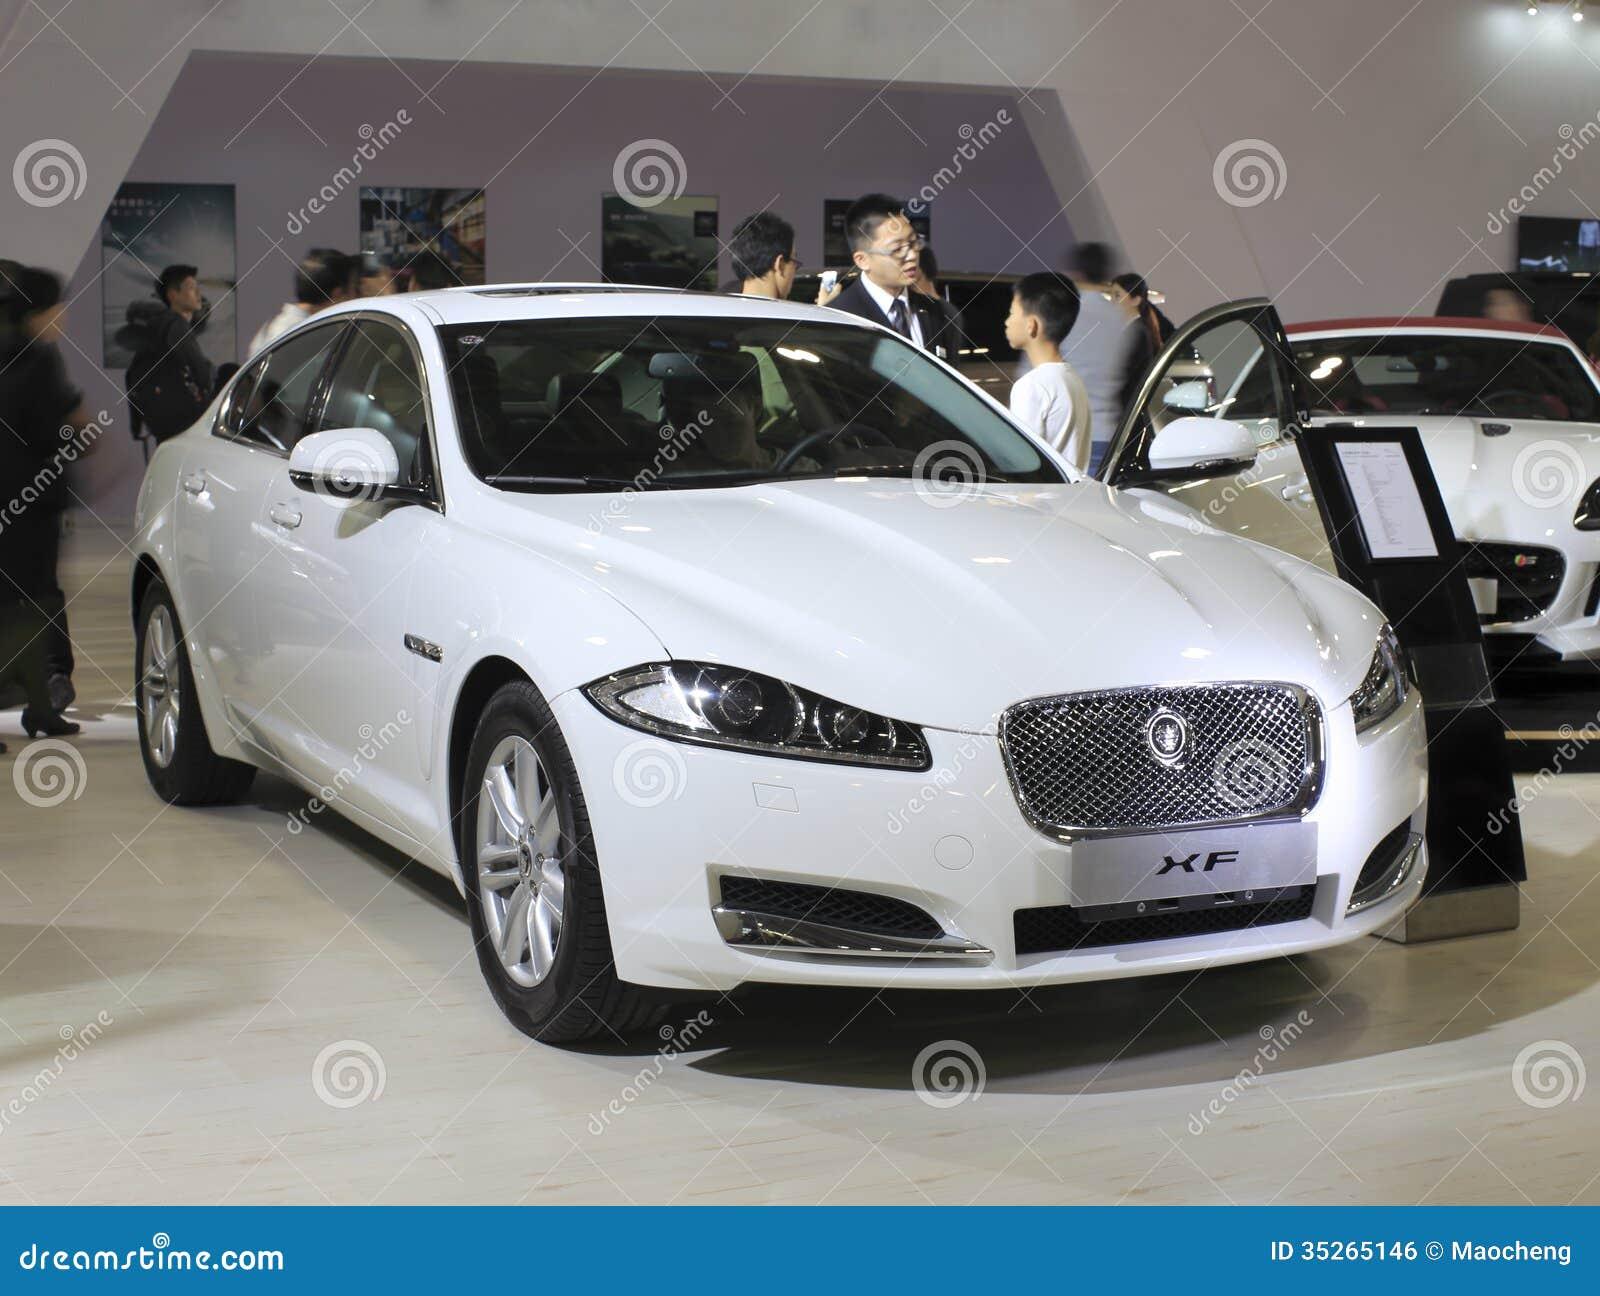 Jaguar Xf Car Editorial Photo Image Of Purchase Model 35265146